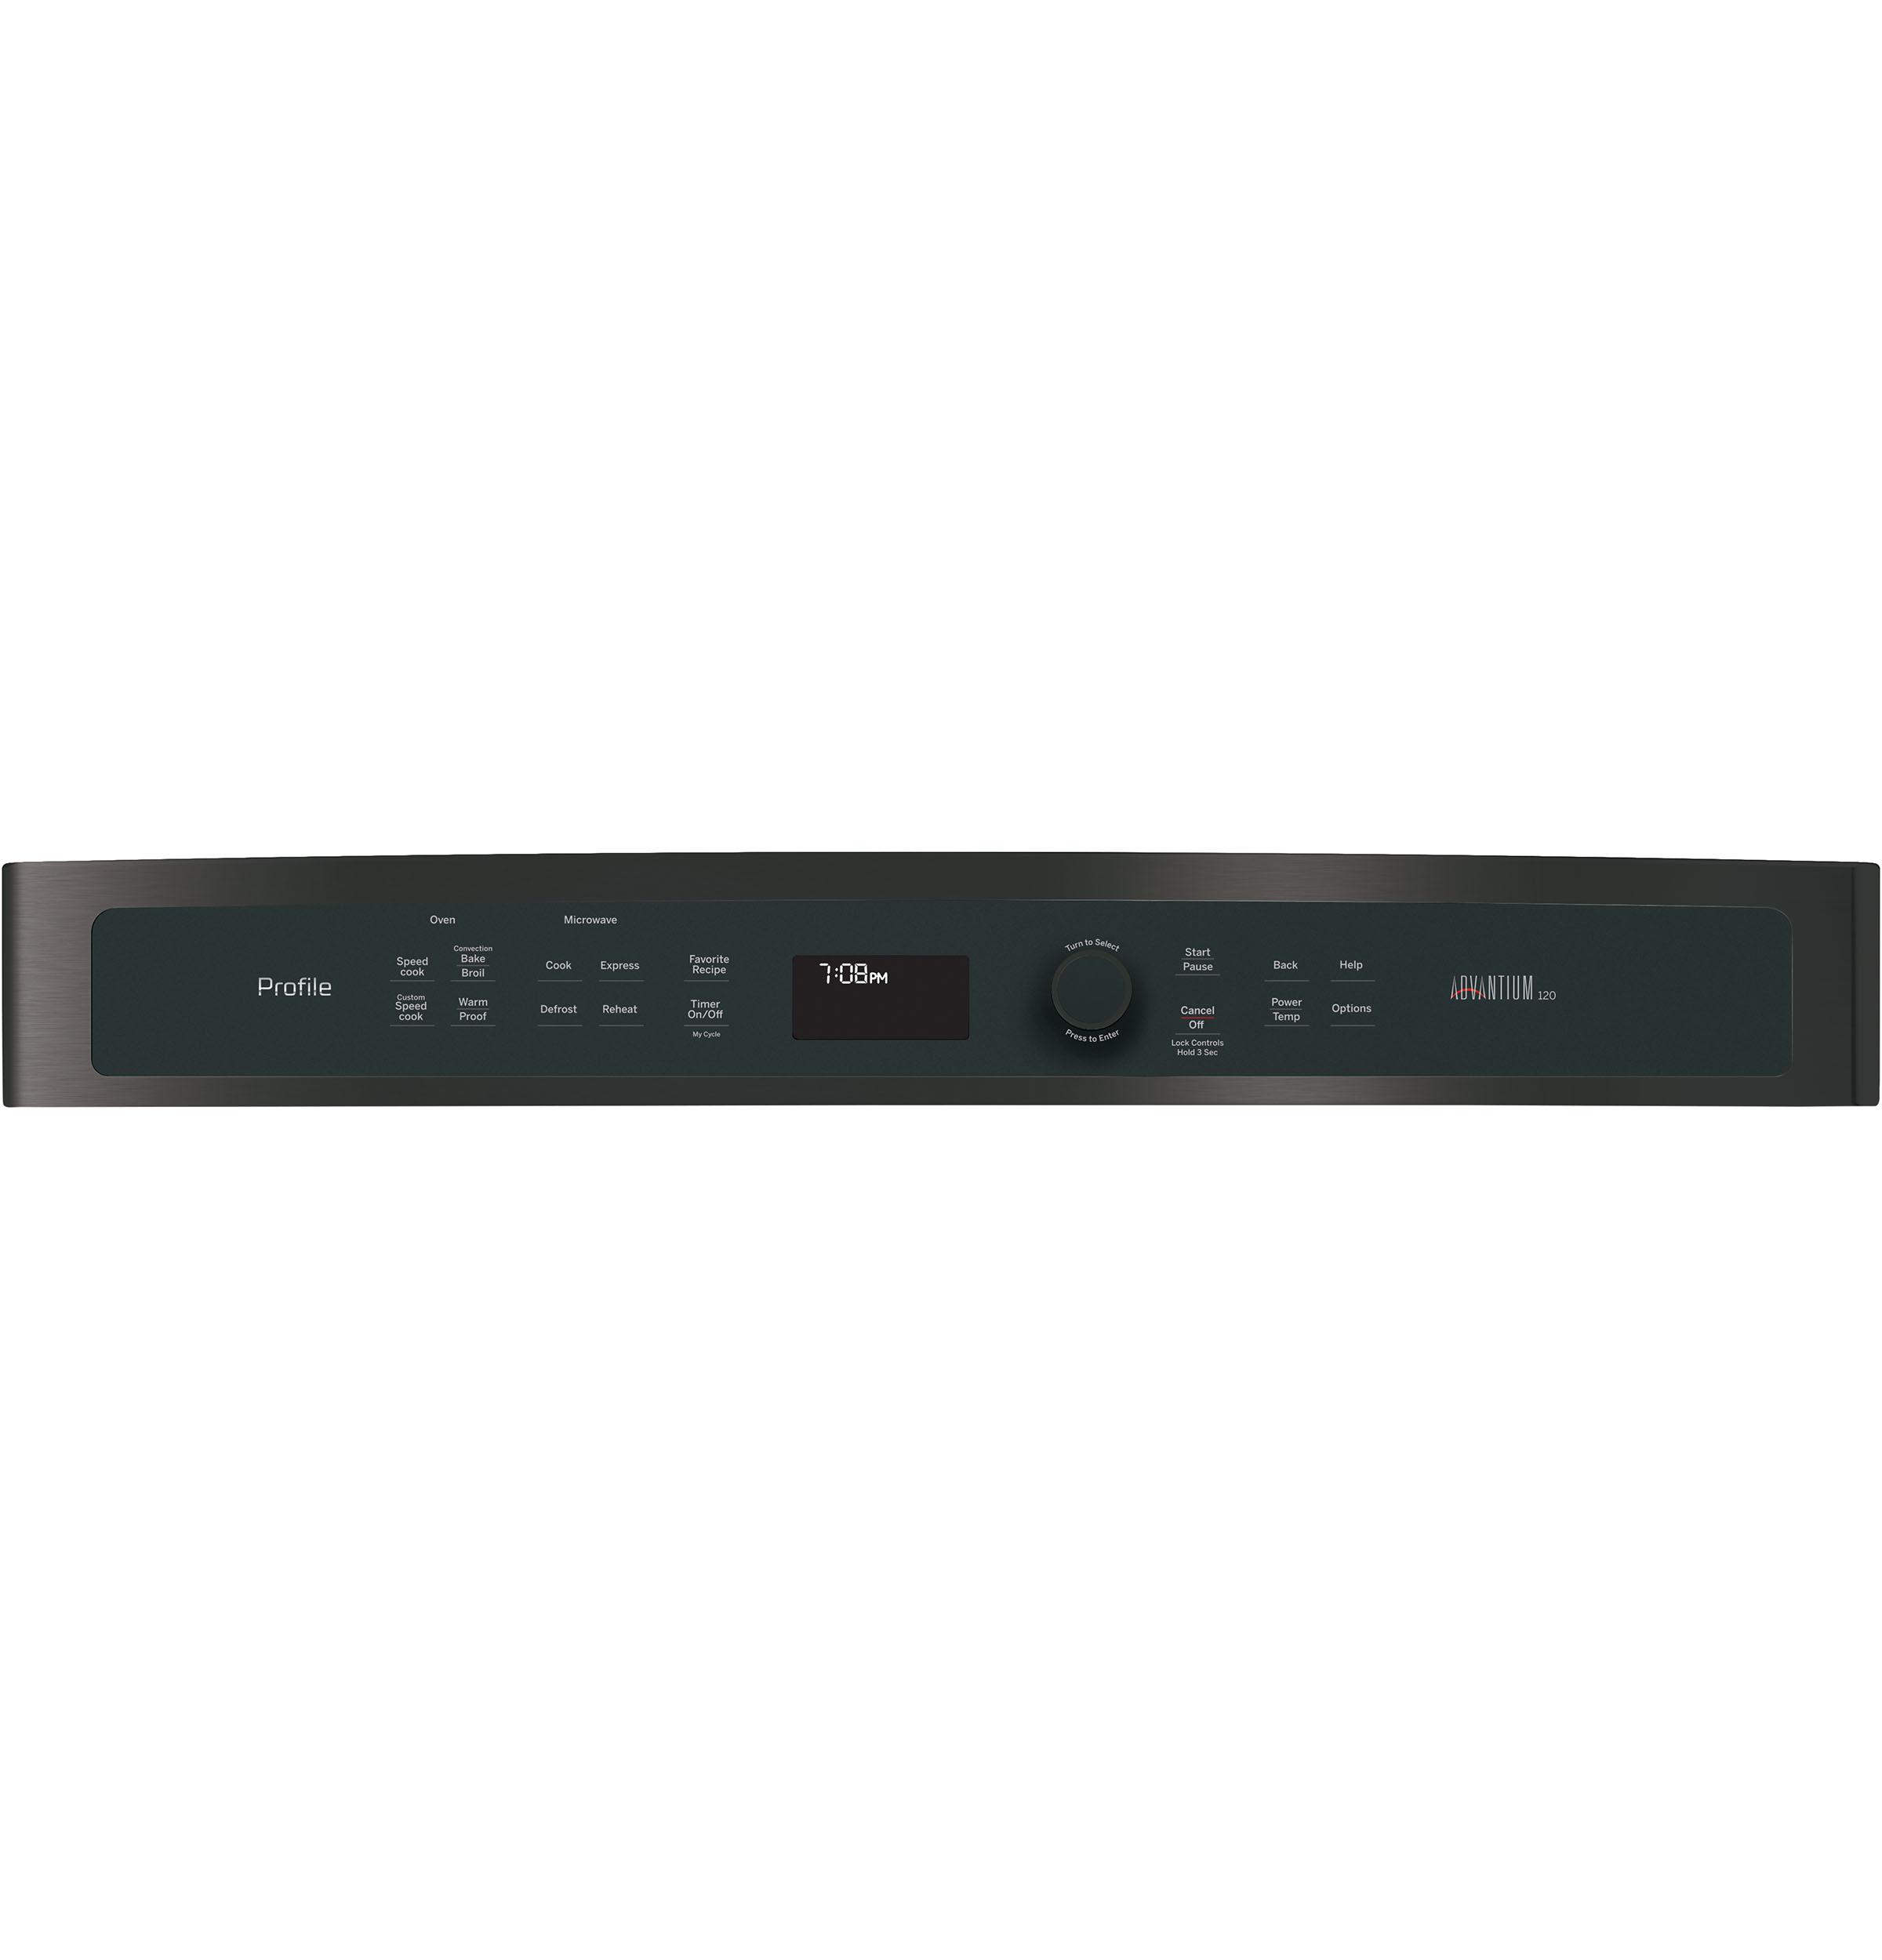 Model: PSB9100BLTS | GE Profile™ Series 27 in. Single Wall Oven Advantium® Technology